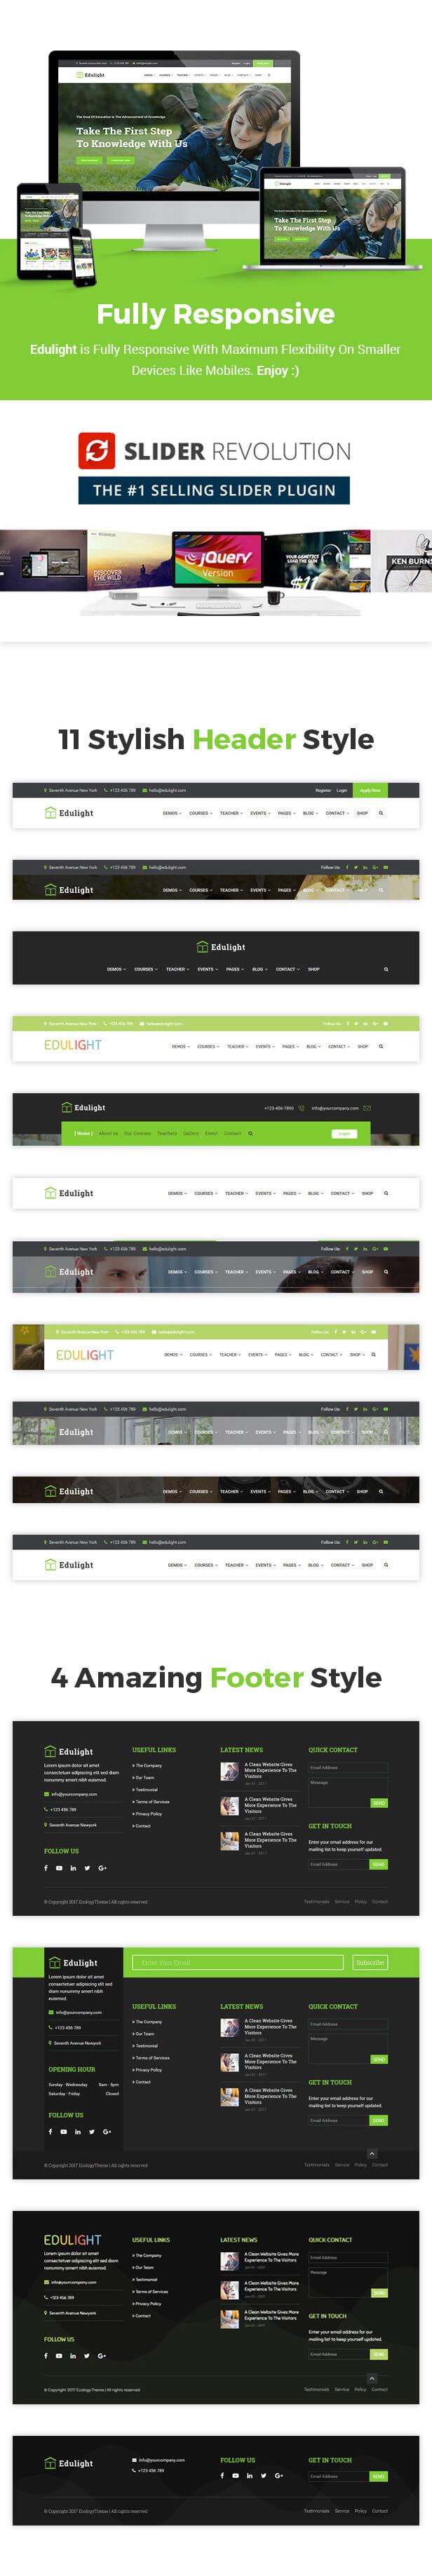 EduVision - Education WordPress Theme